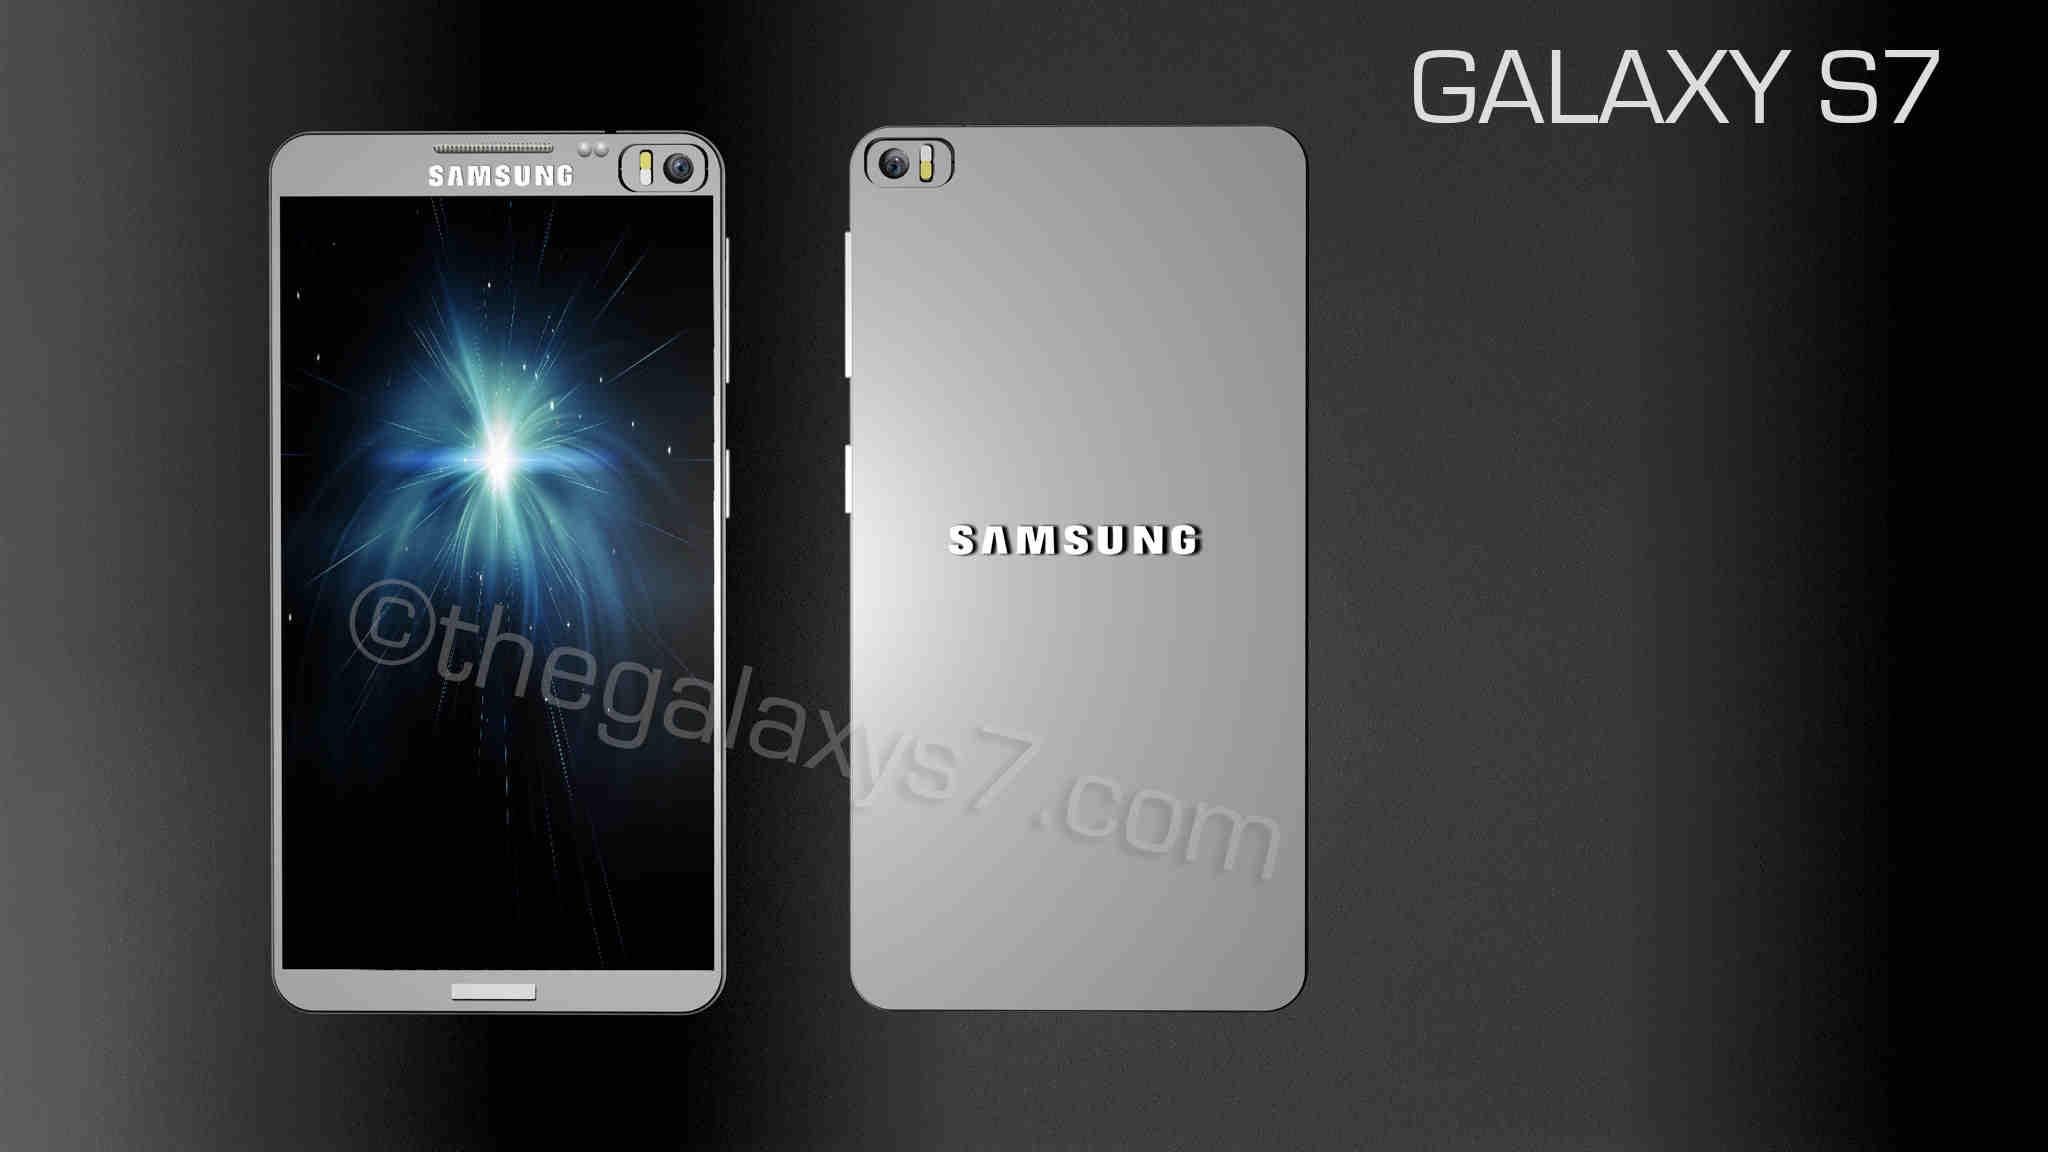 Samsung Galaxy S7 ar putea integra din nou un cip Qualcomm